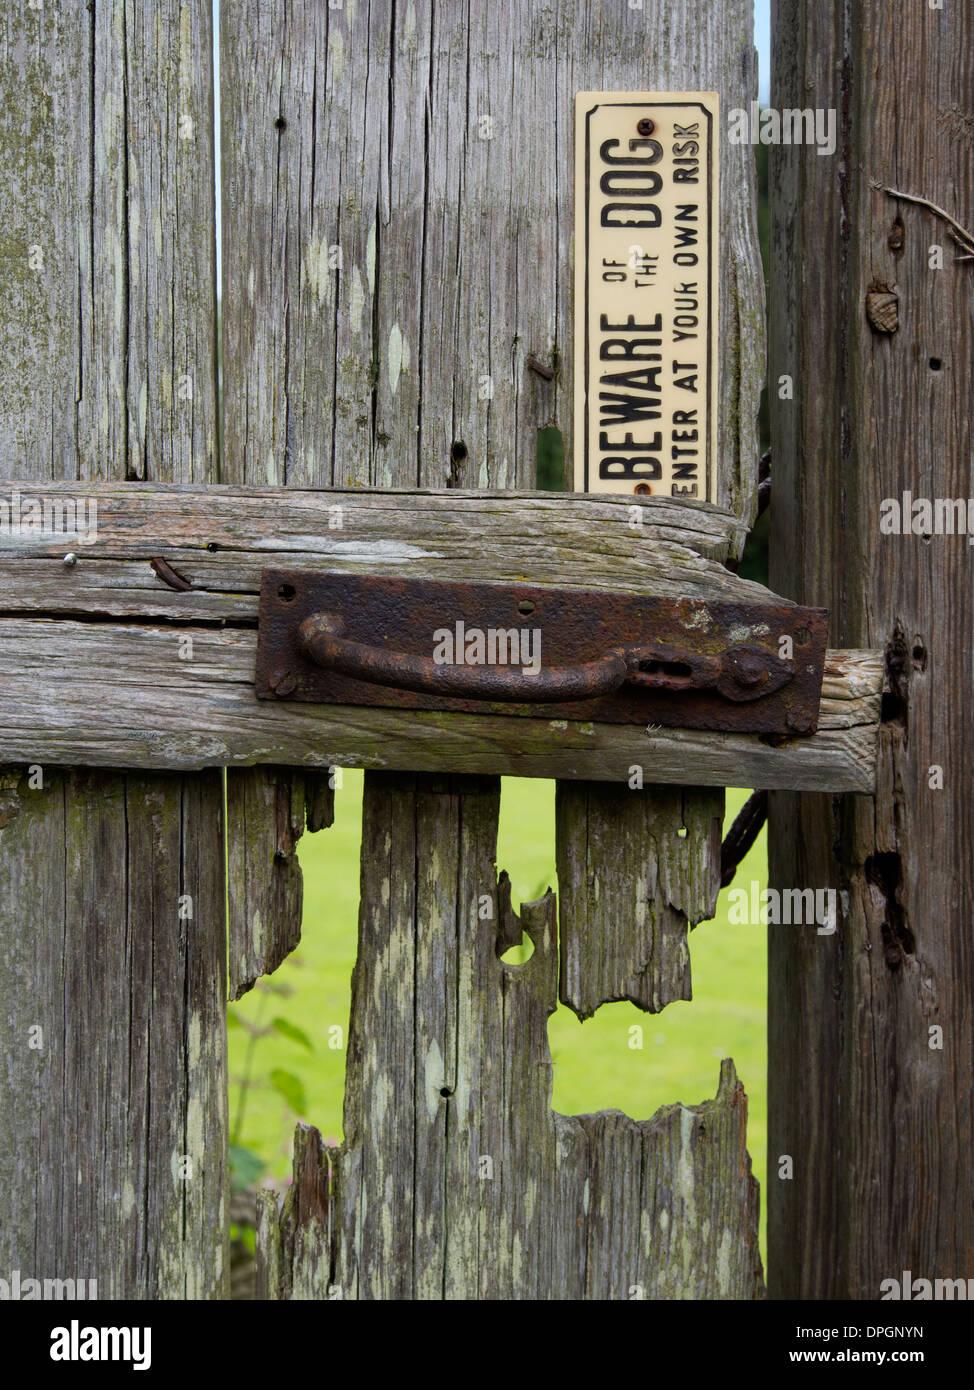 a decrepit old wooden gate warns of a dog long gone - Stock Image